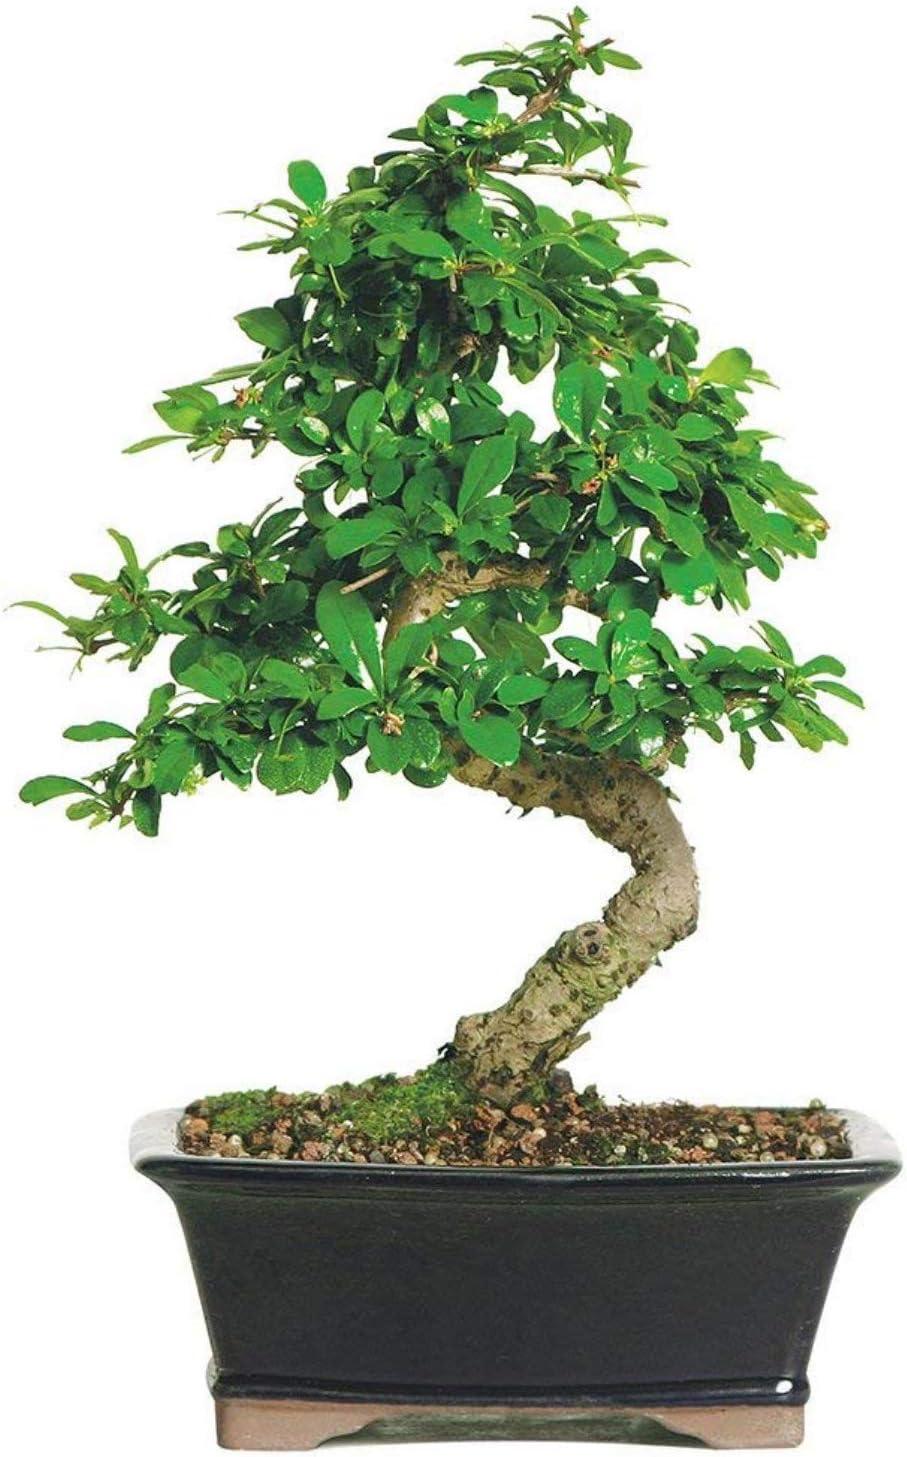 Brussel's Bonsai Live Fukien Tea Indoor Bonsai Tree-6 Years Old 6